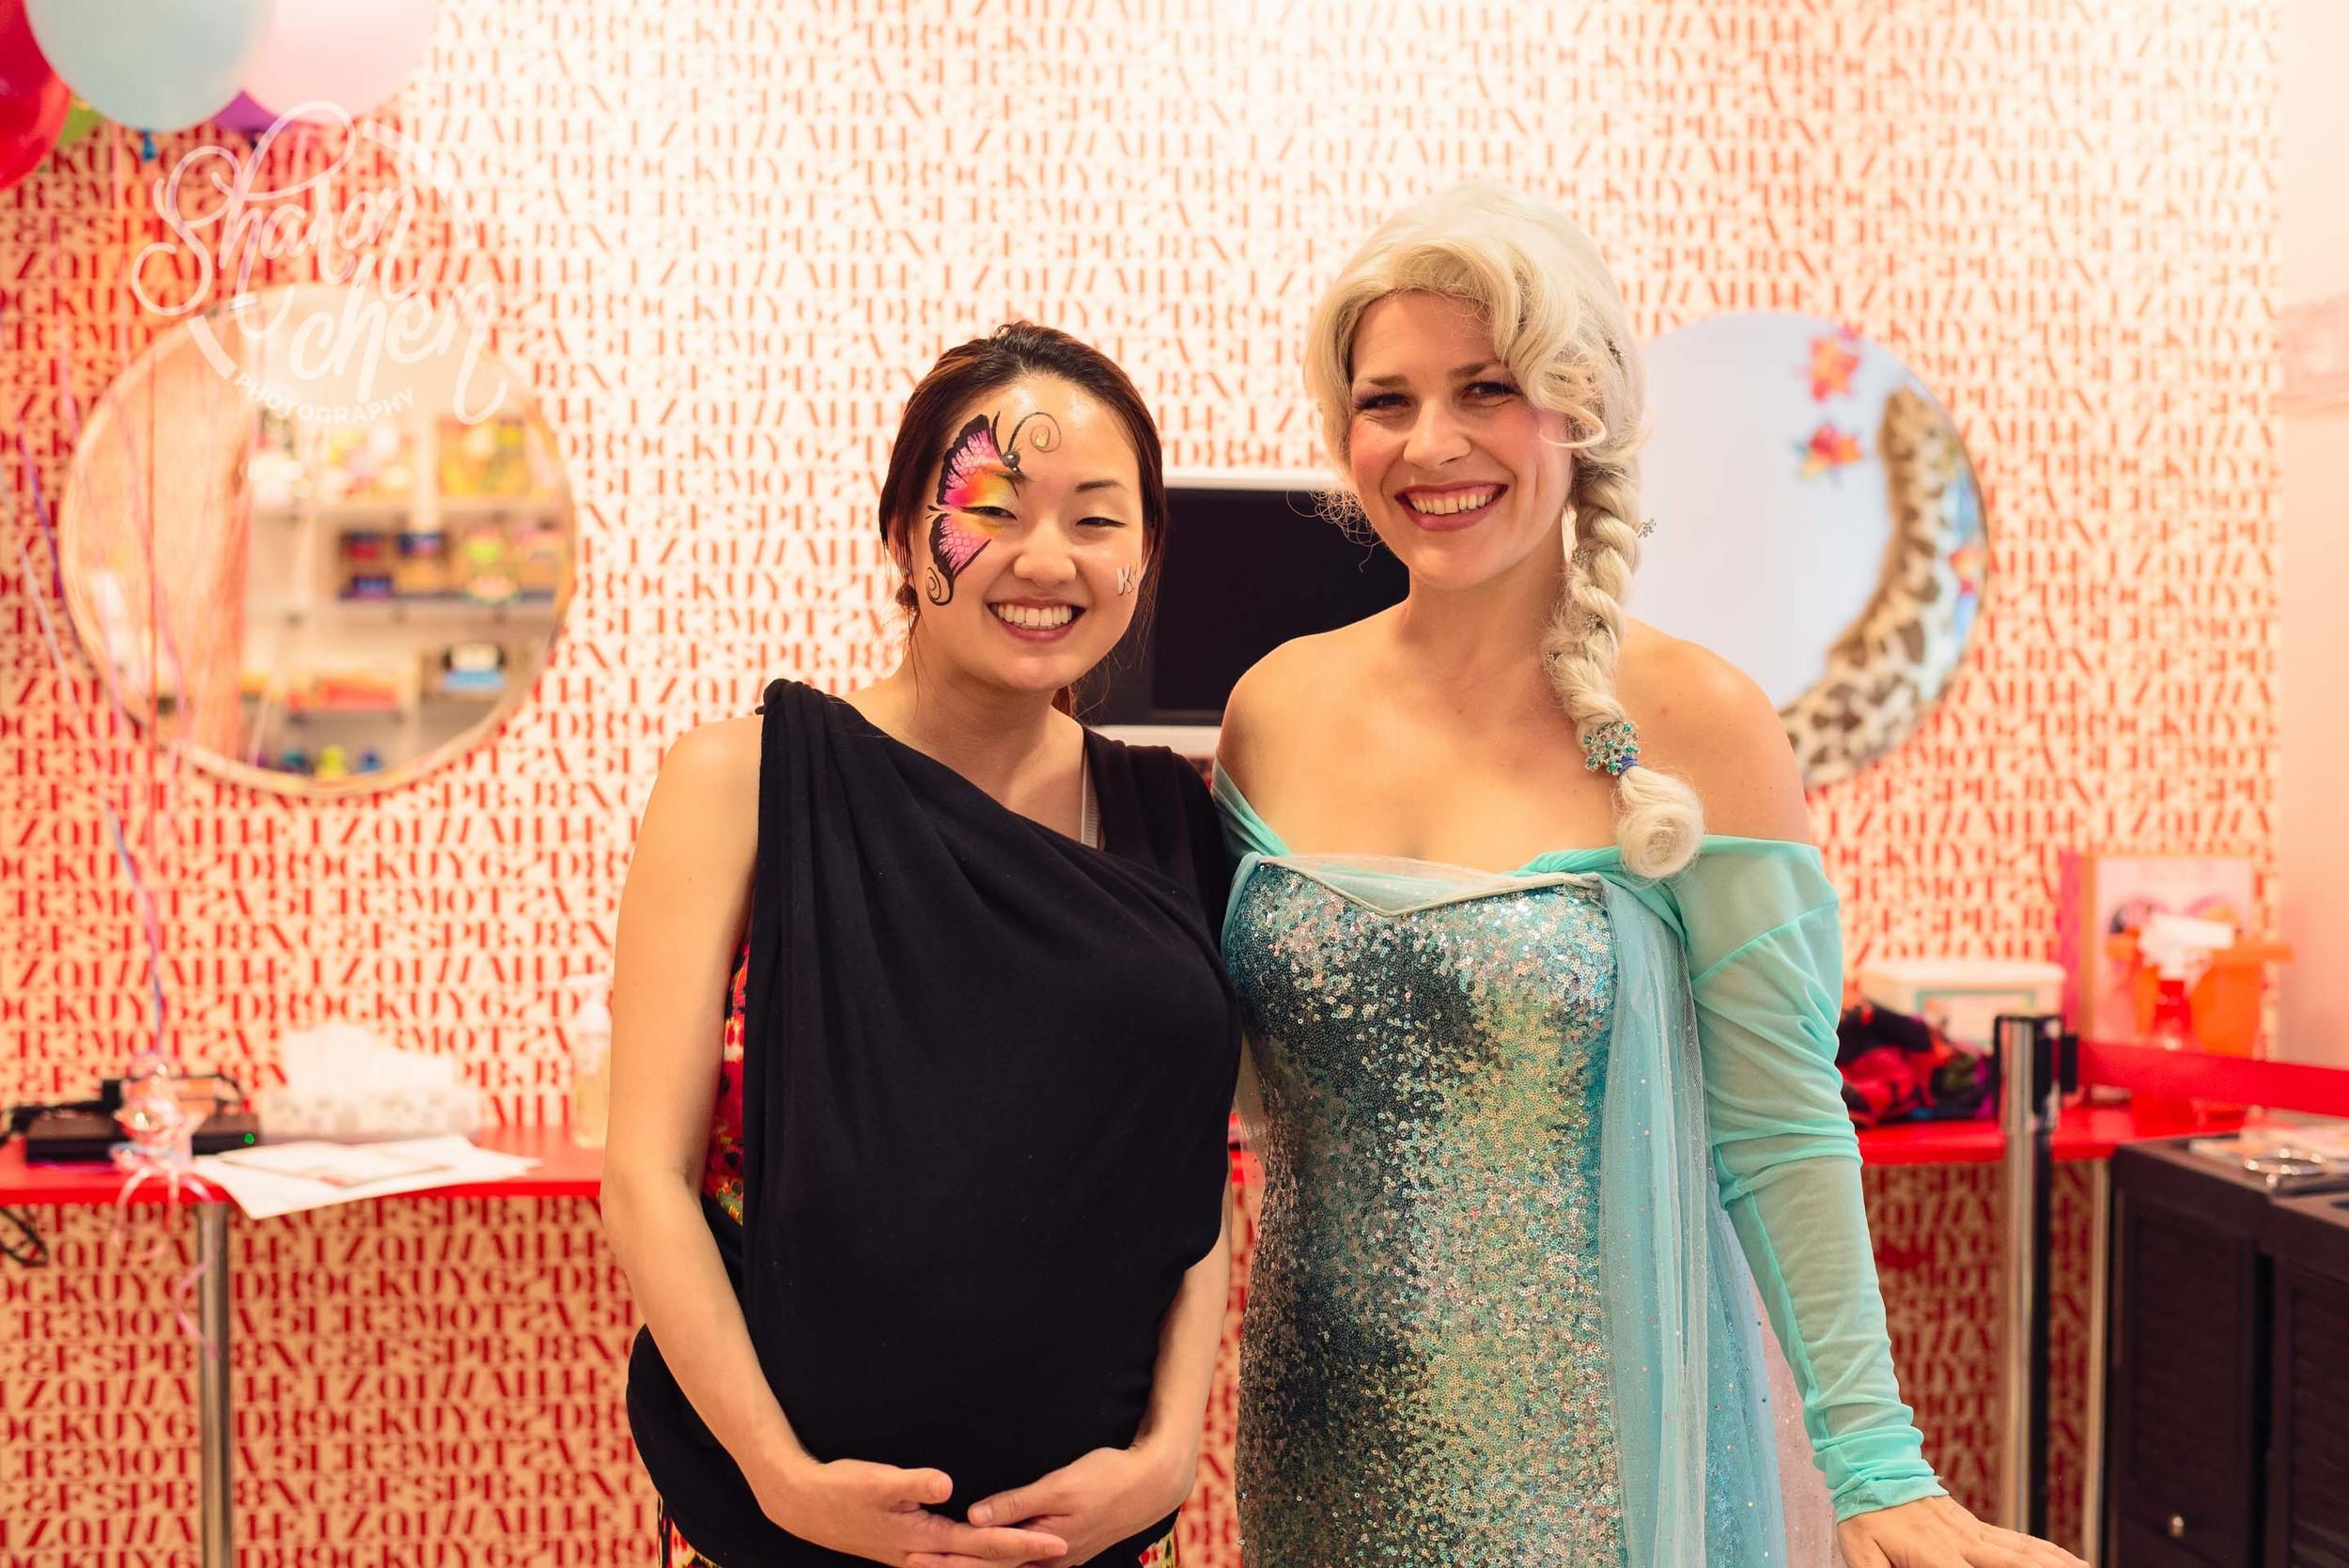 Jenny and Elsa